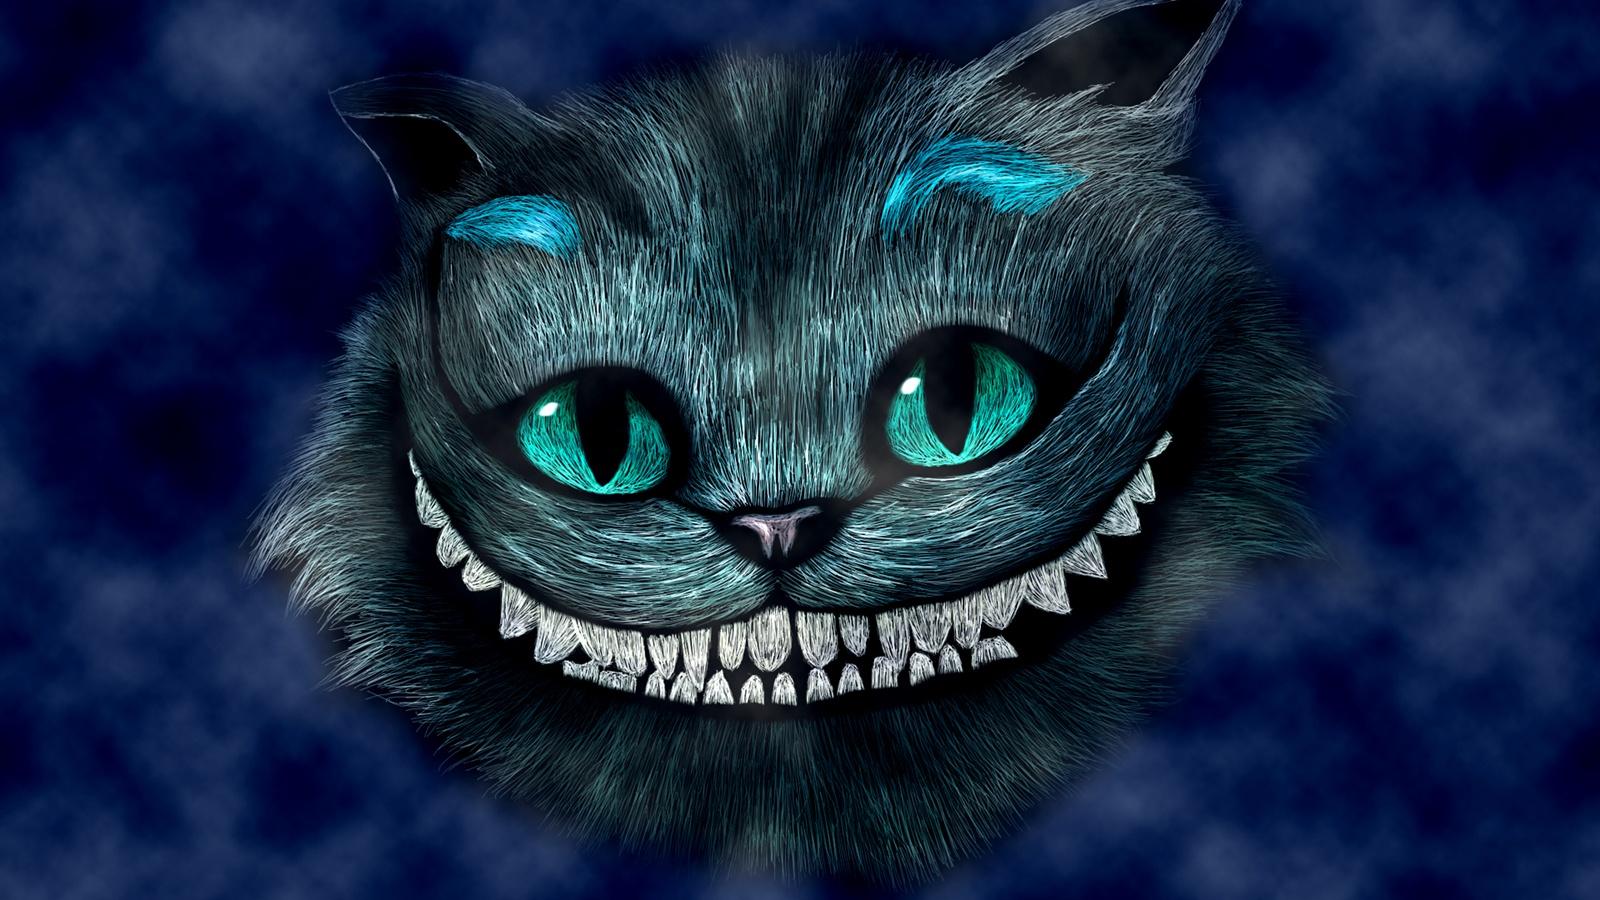 Alice-in-Wonderland-smiling-Cheshire-Cat